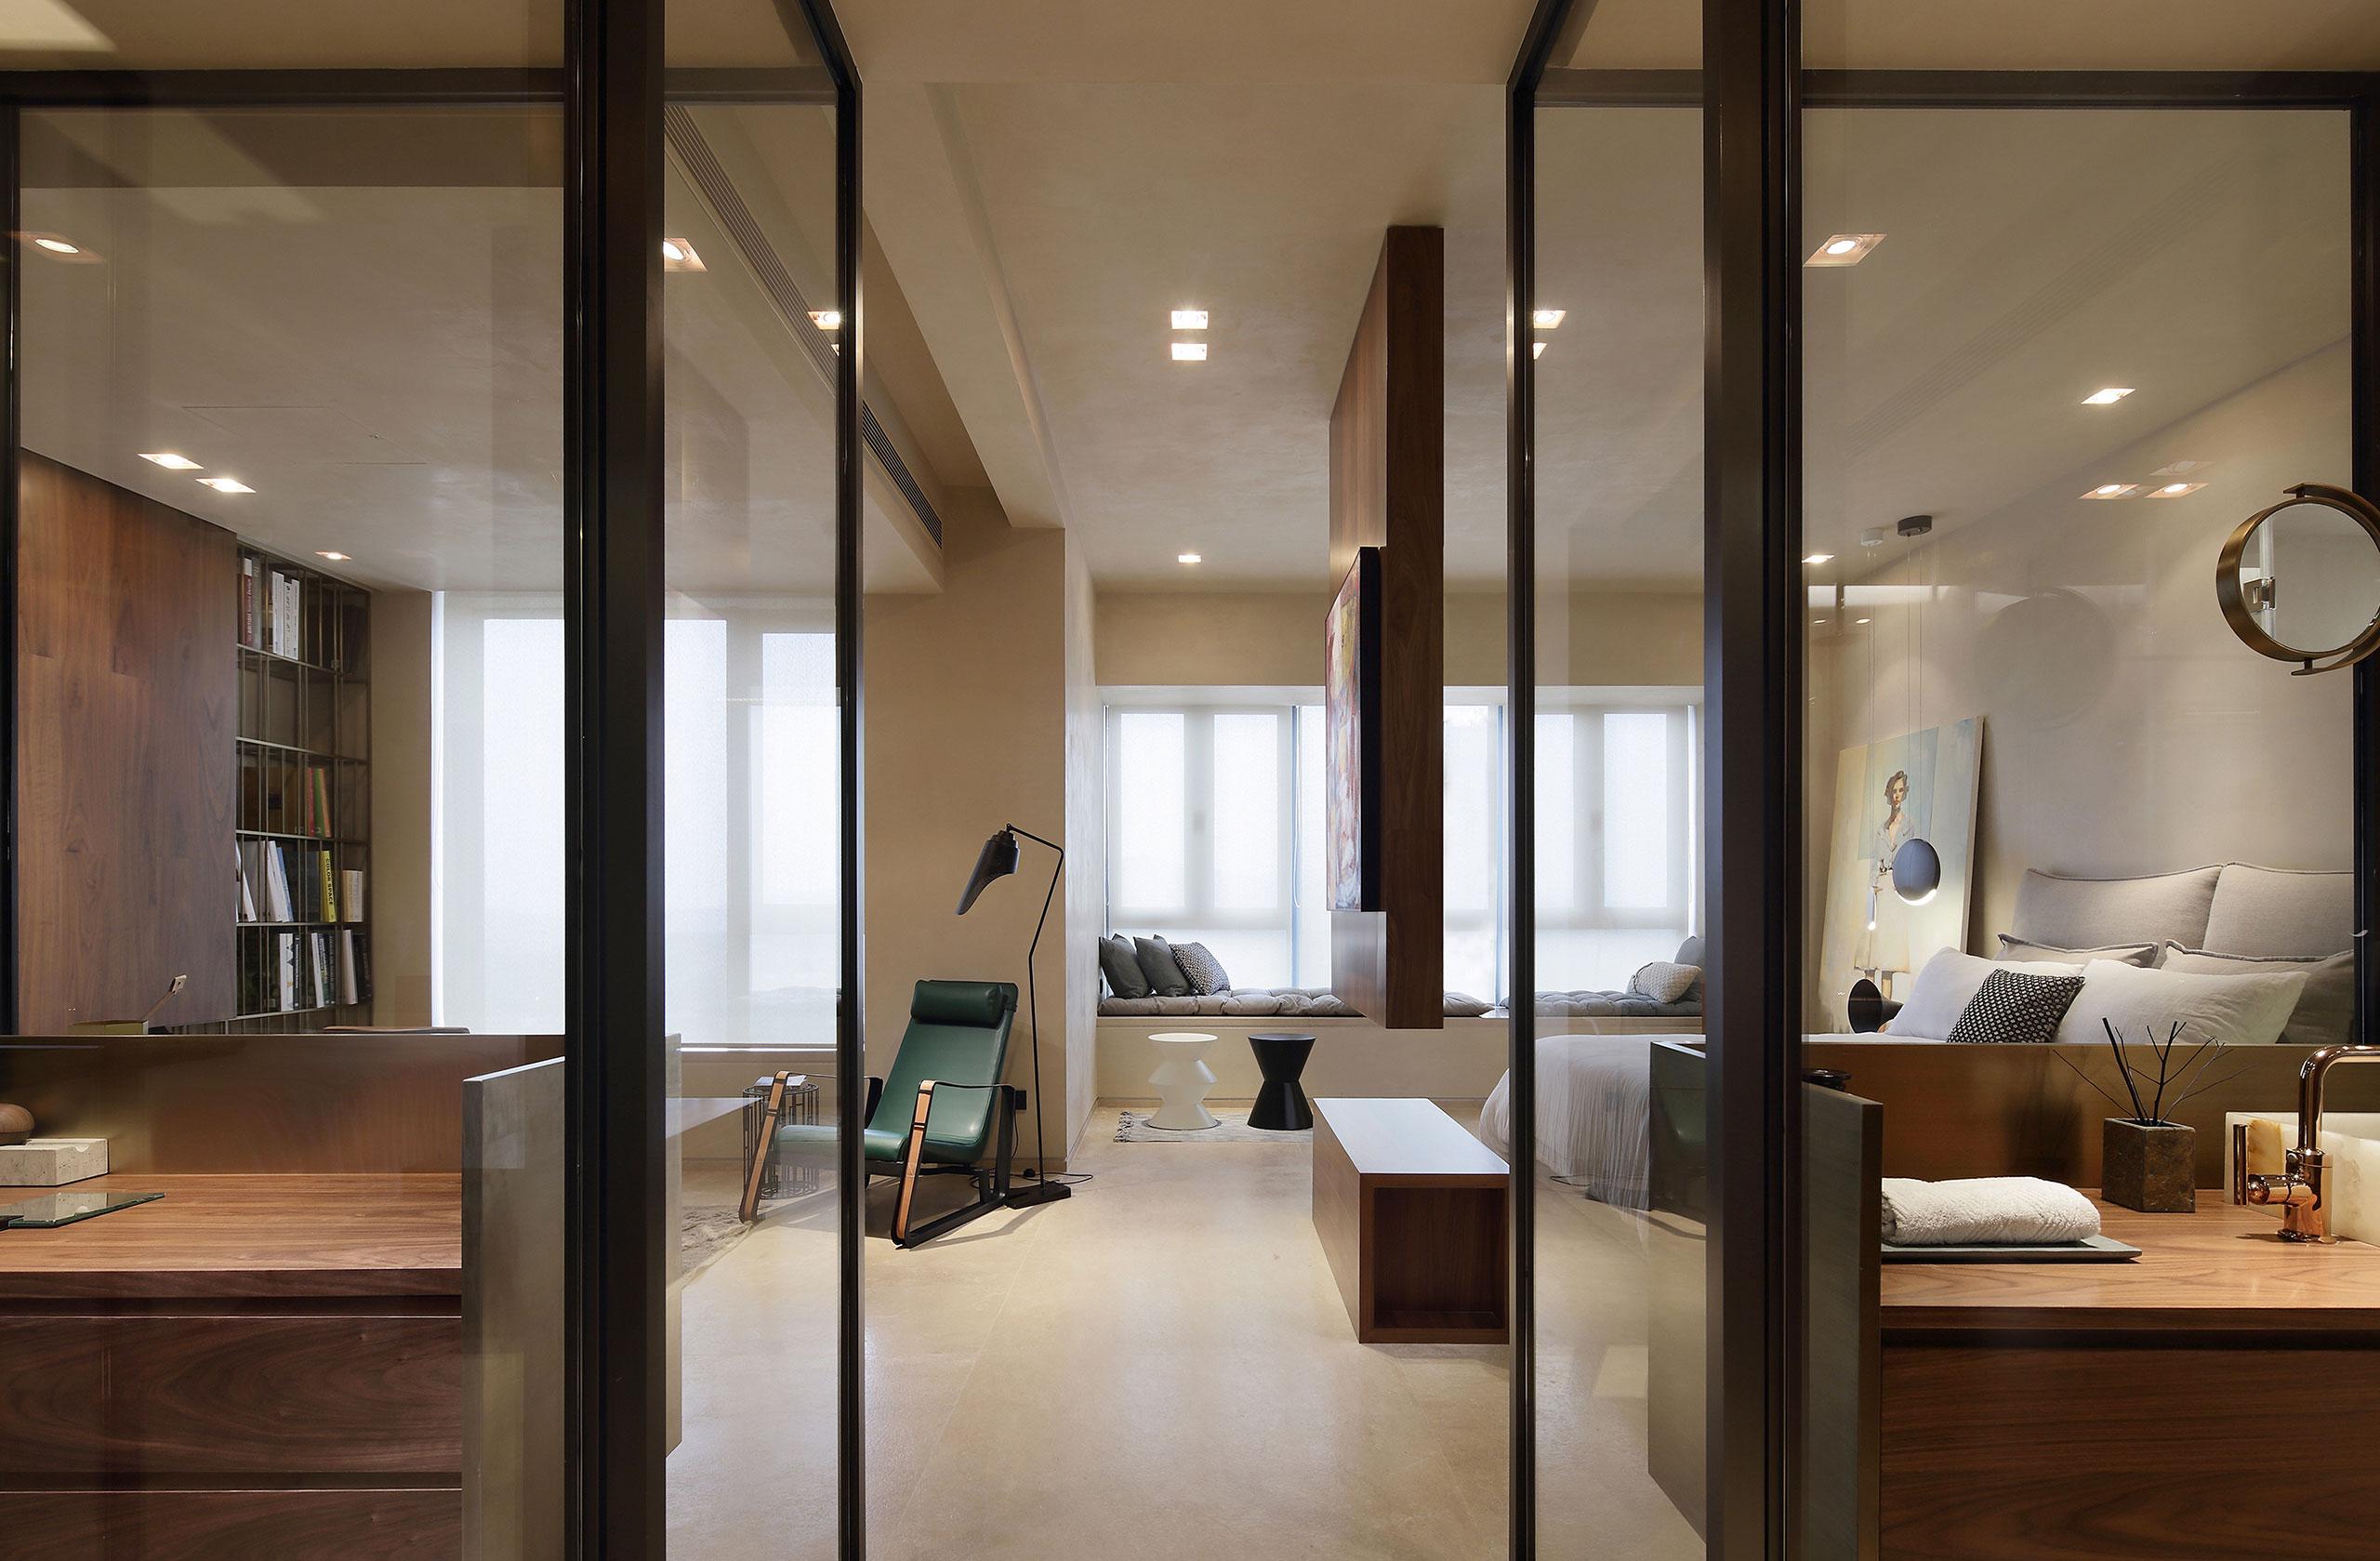 p5_show_flat_origins_dongguan_china_minas_kosmidis_architecture_in_concept_yatzer